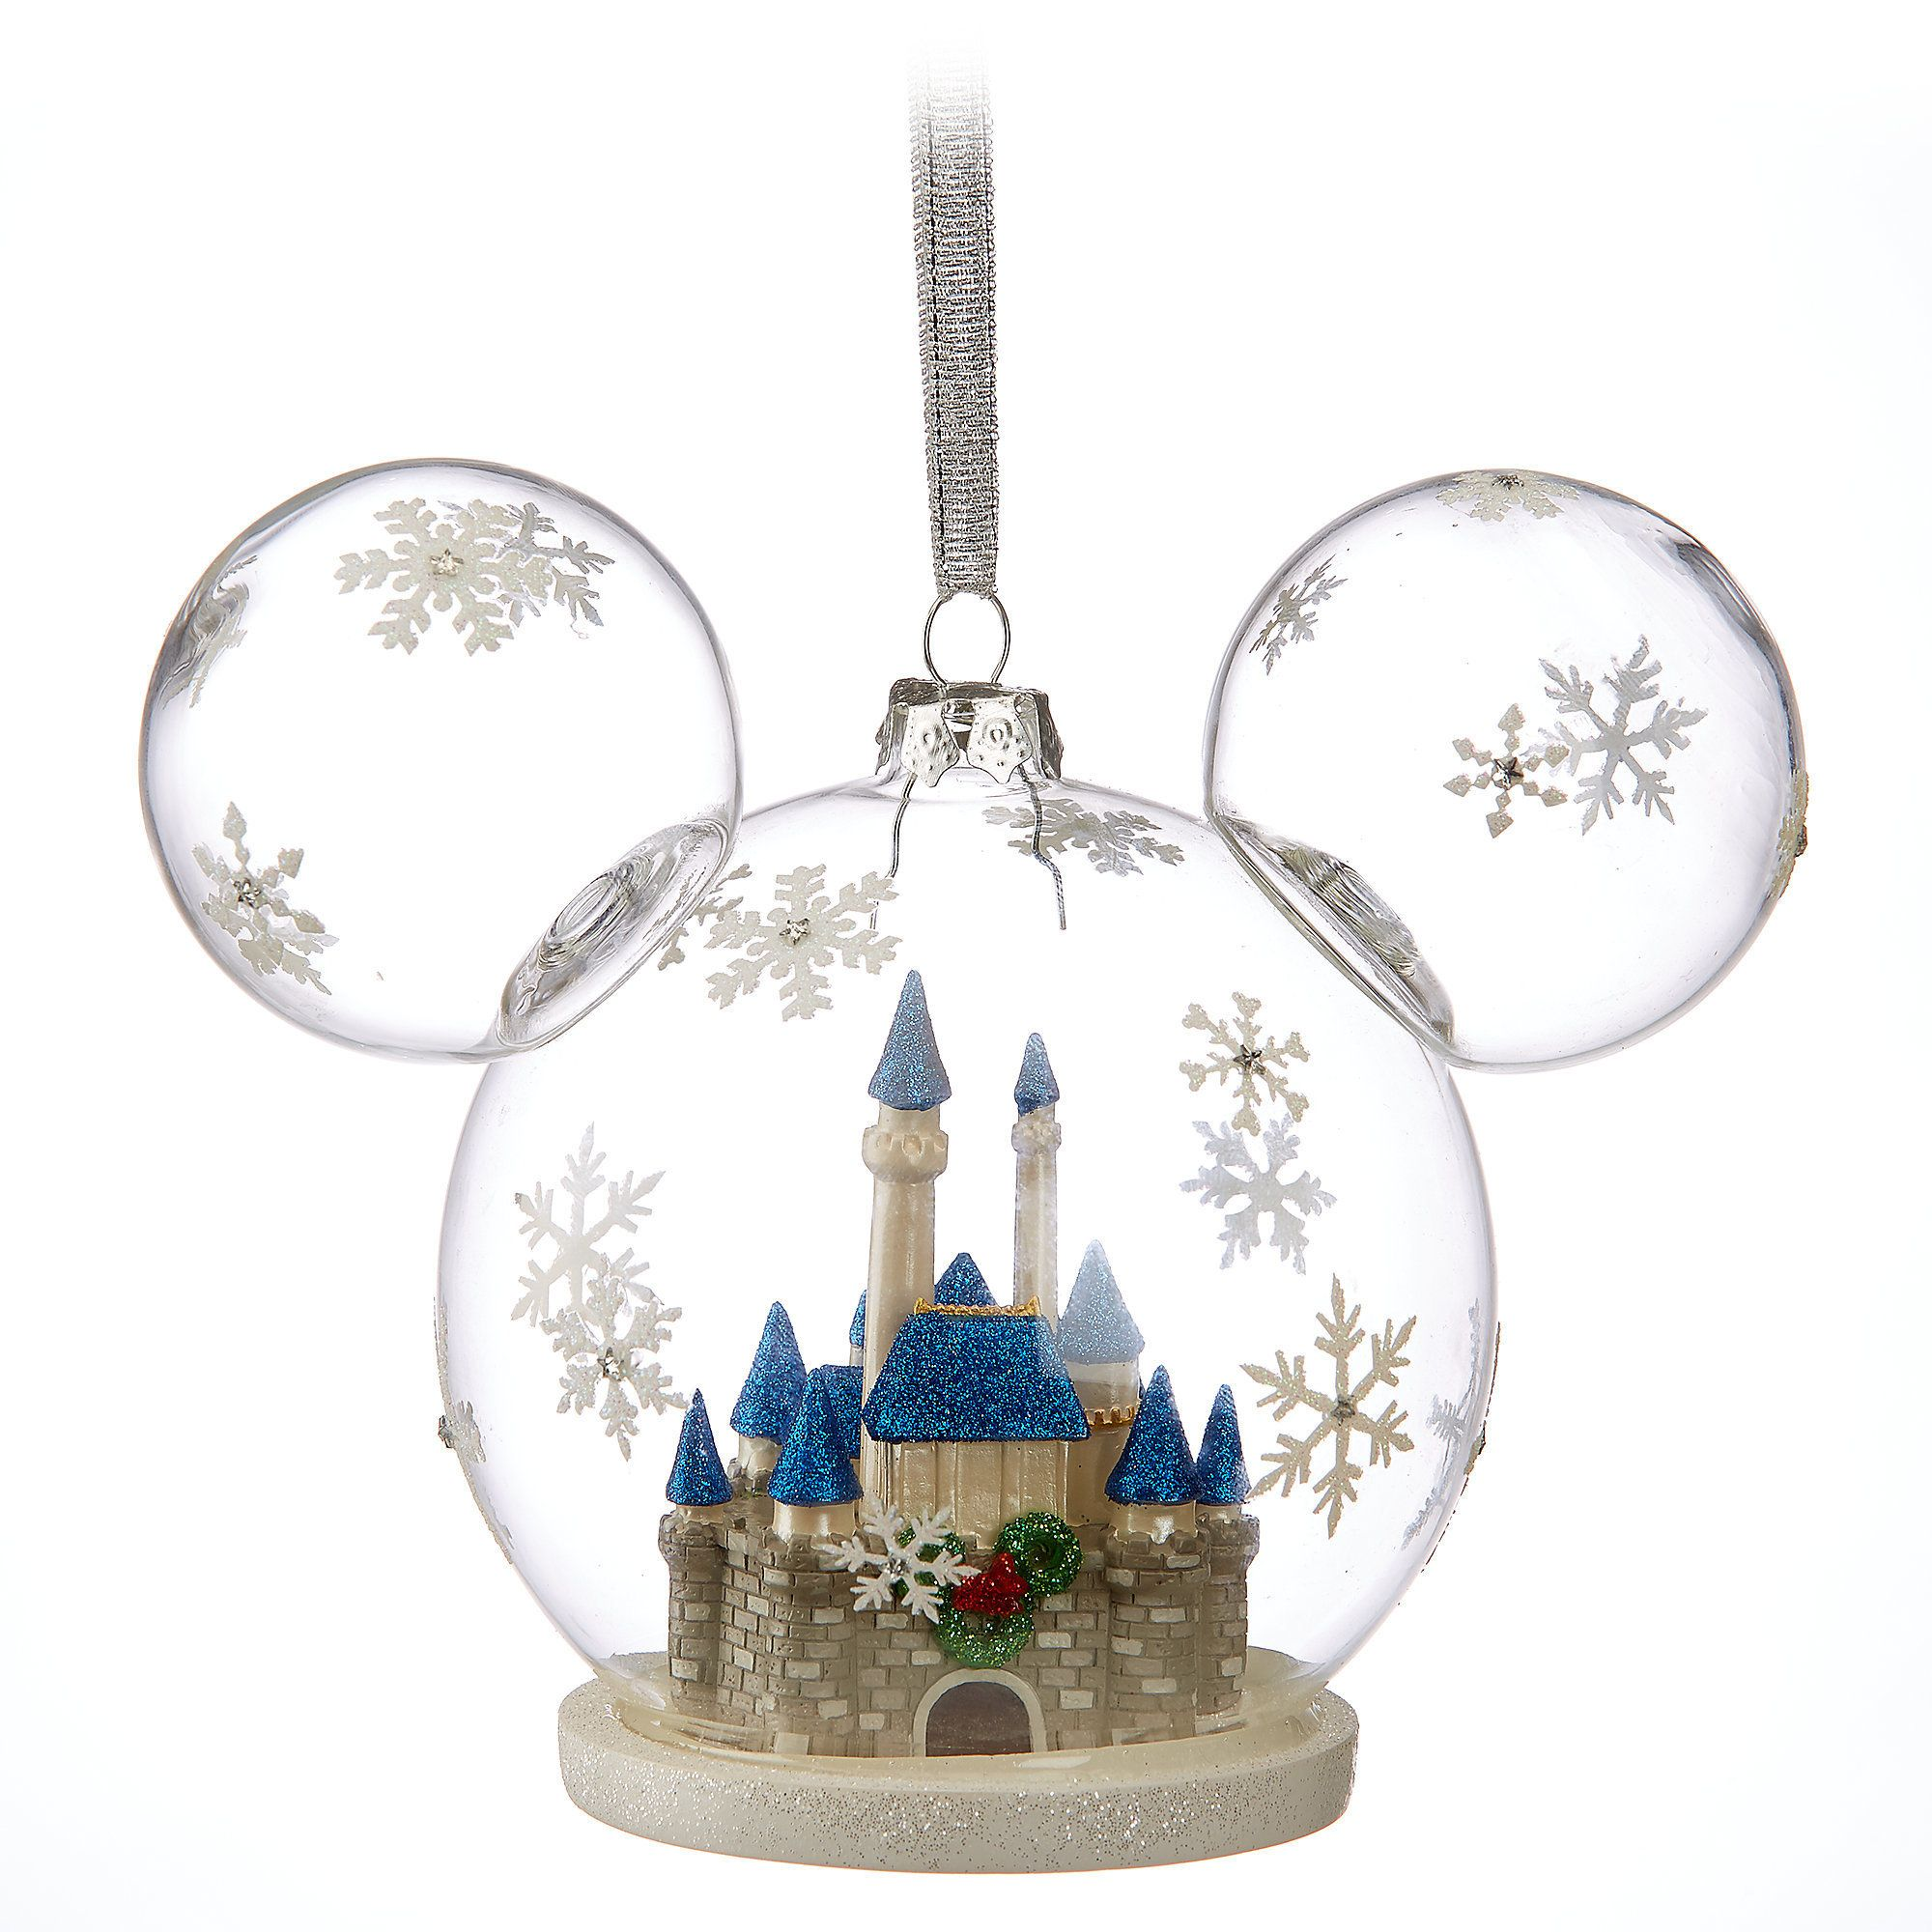 Mickey Mouse Fantasyland Castle Ornament   Christmas   Pinterest ...